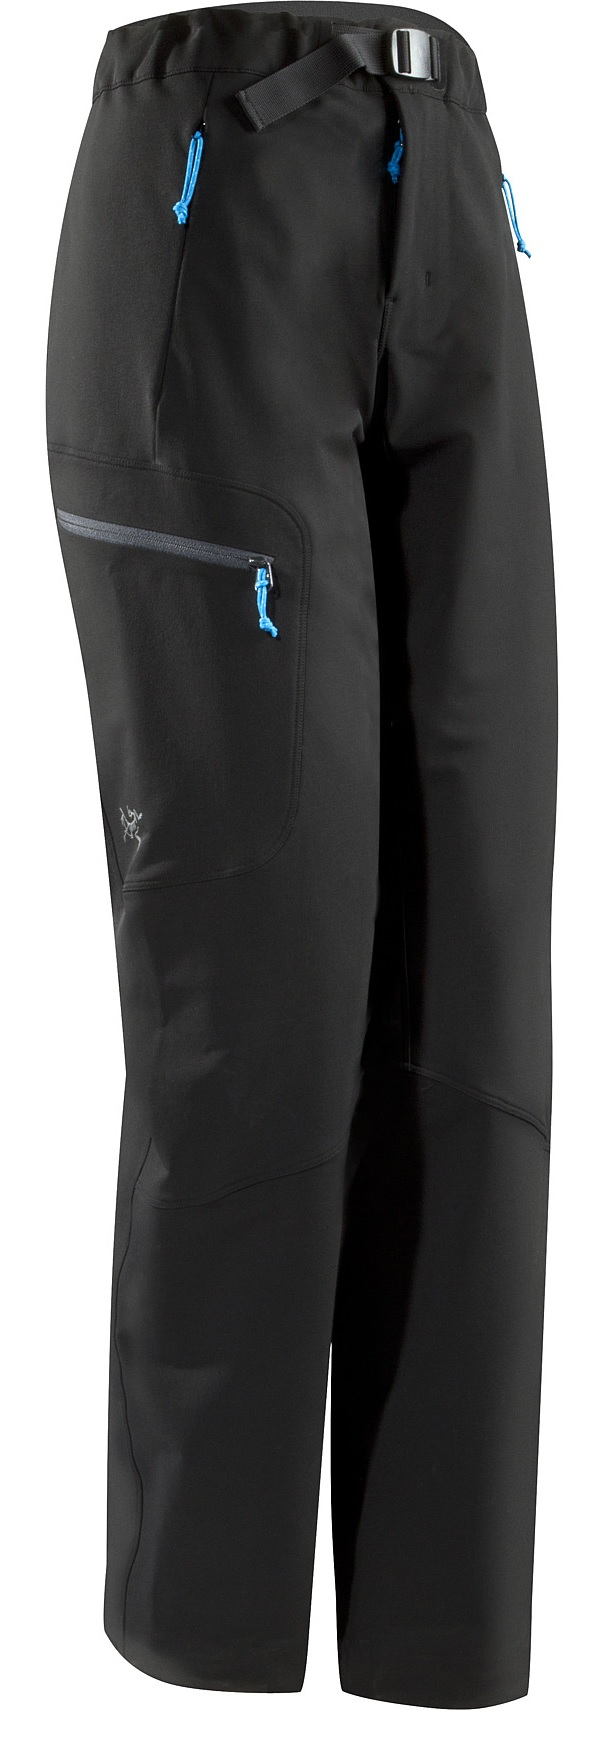 Softshell брюки с доставкой